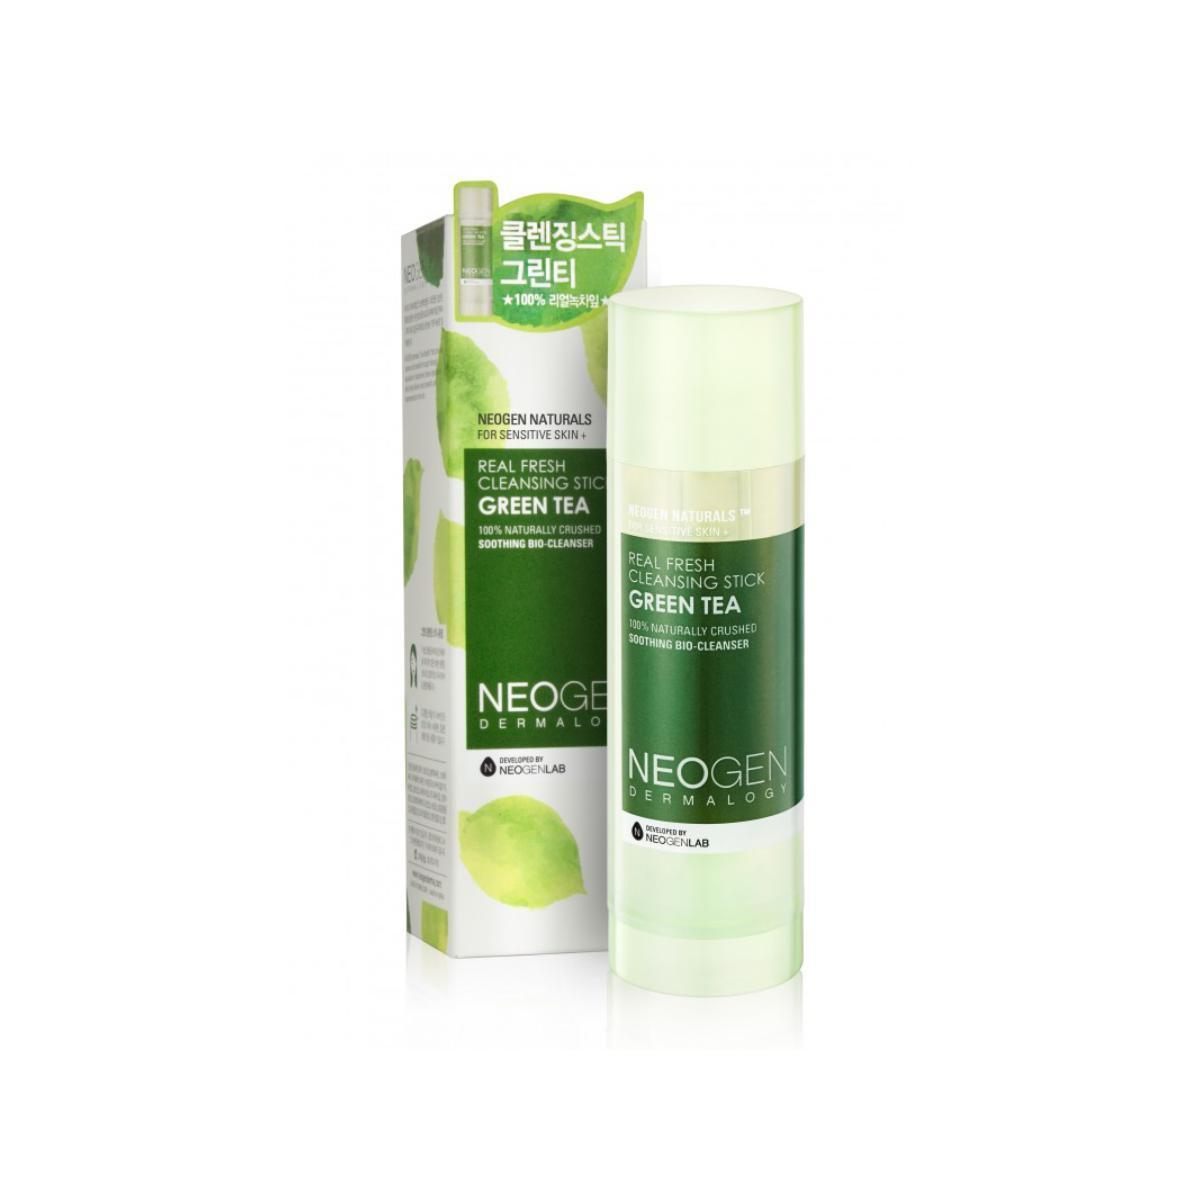 Очищающий стик с зеленым чаем Neogen Dermalogy Real Fresh Cleansing Stick Green Tea, 80 мл